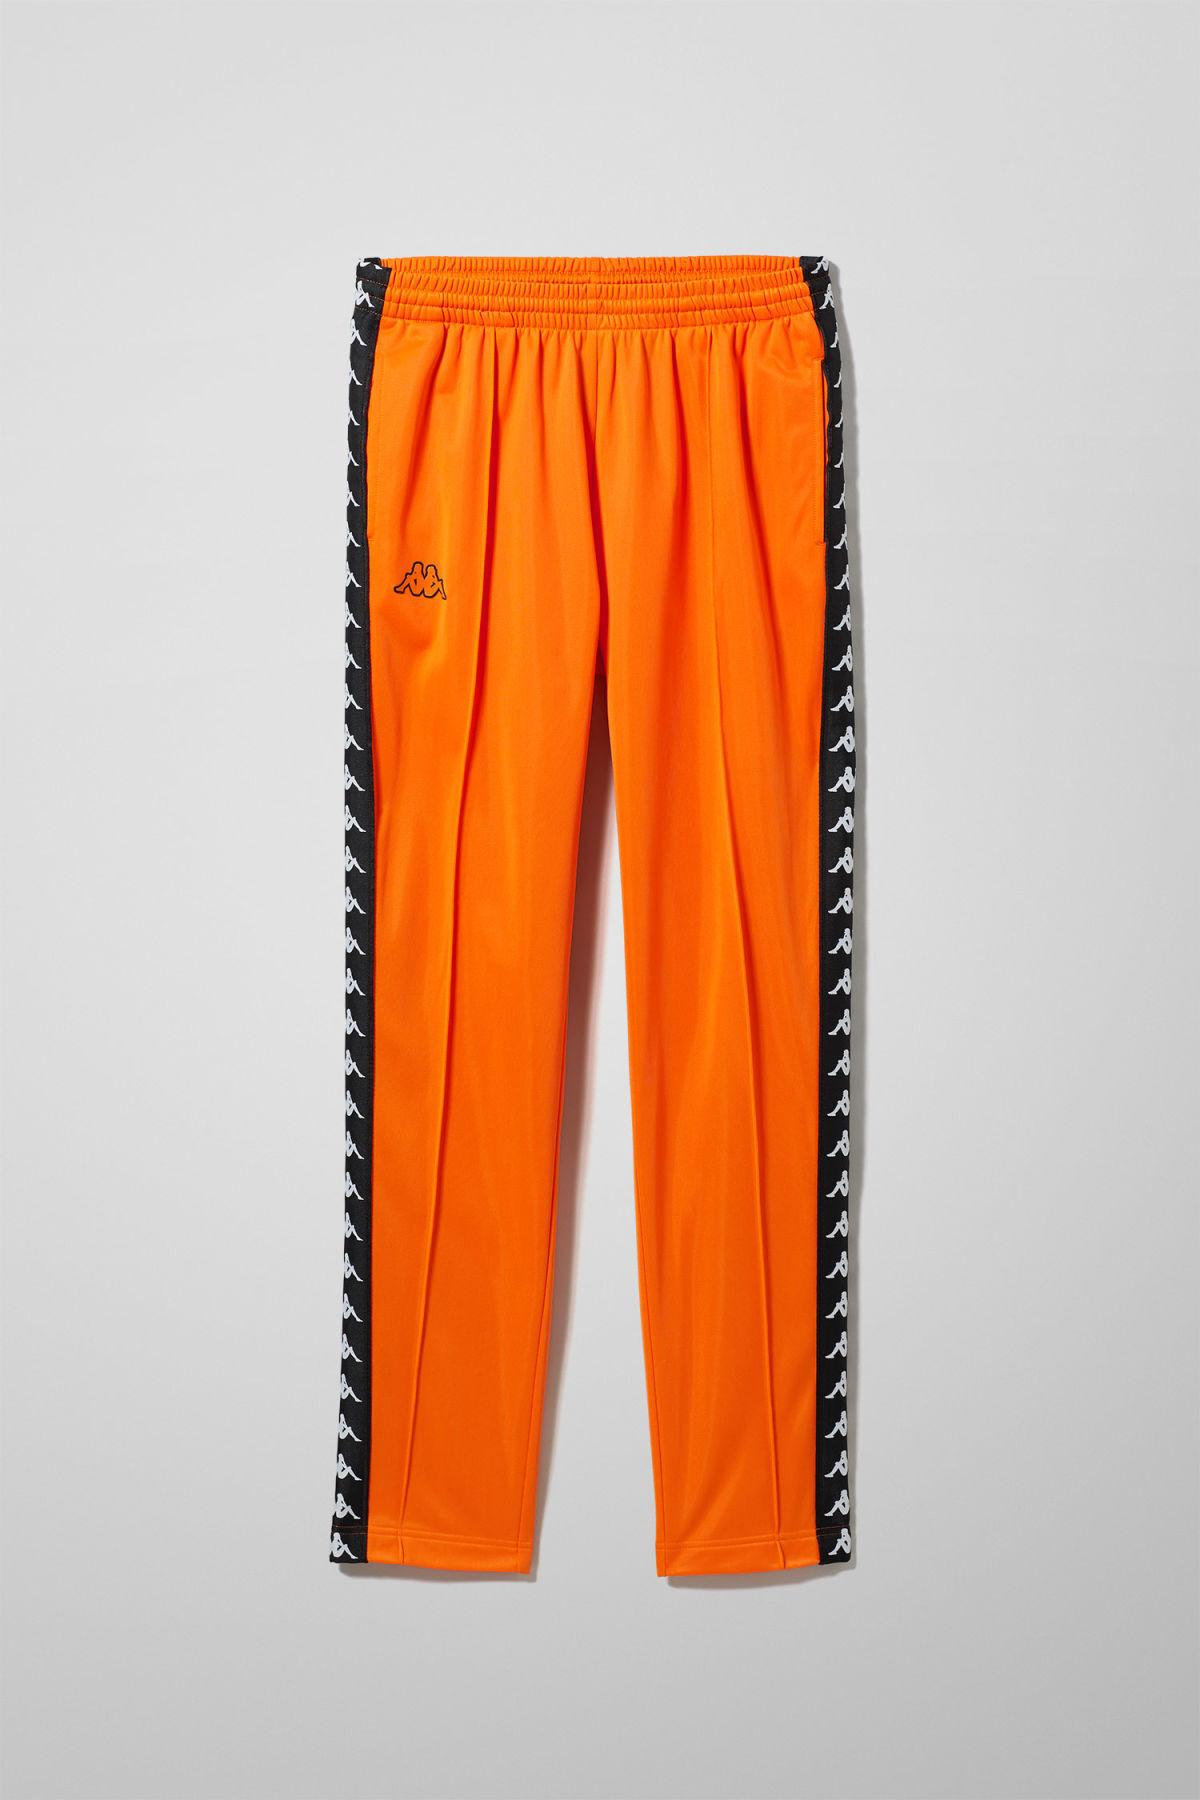 Astoria Snap Pants - Orange-XS